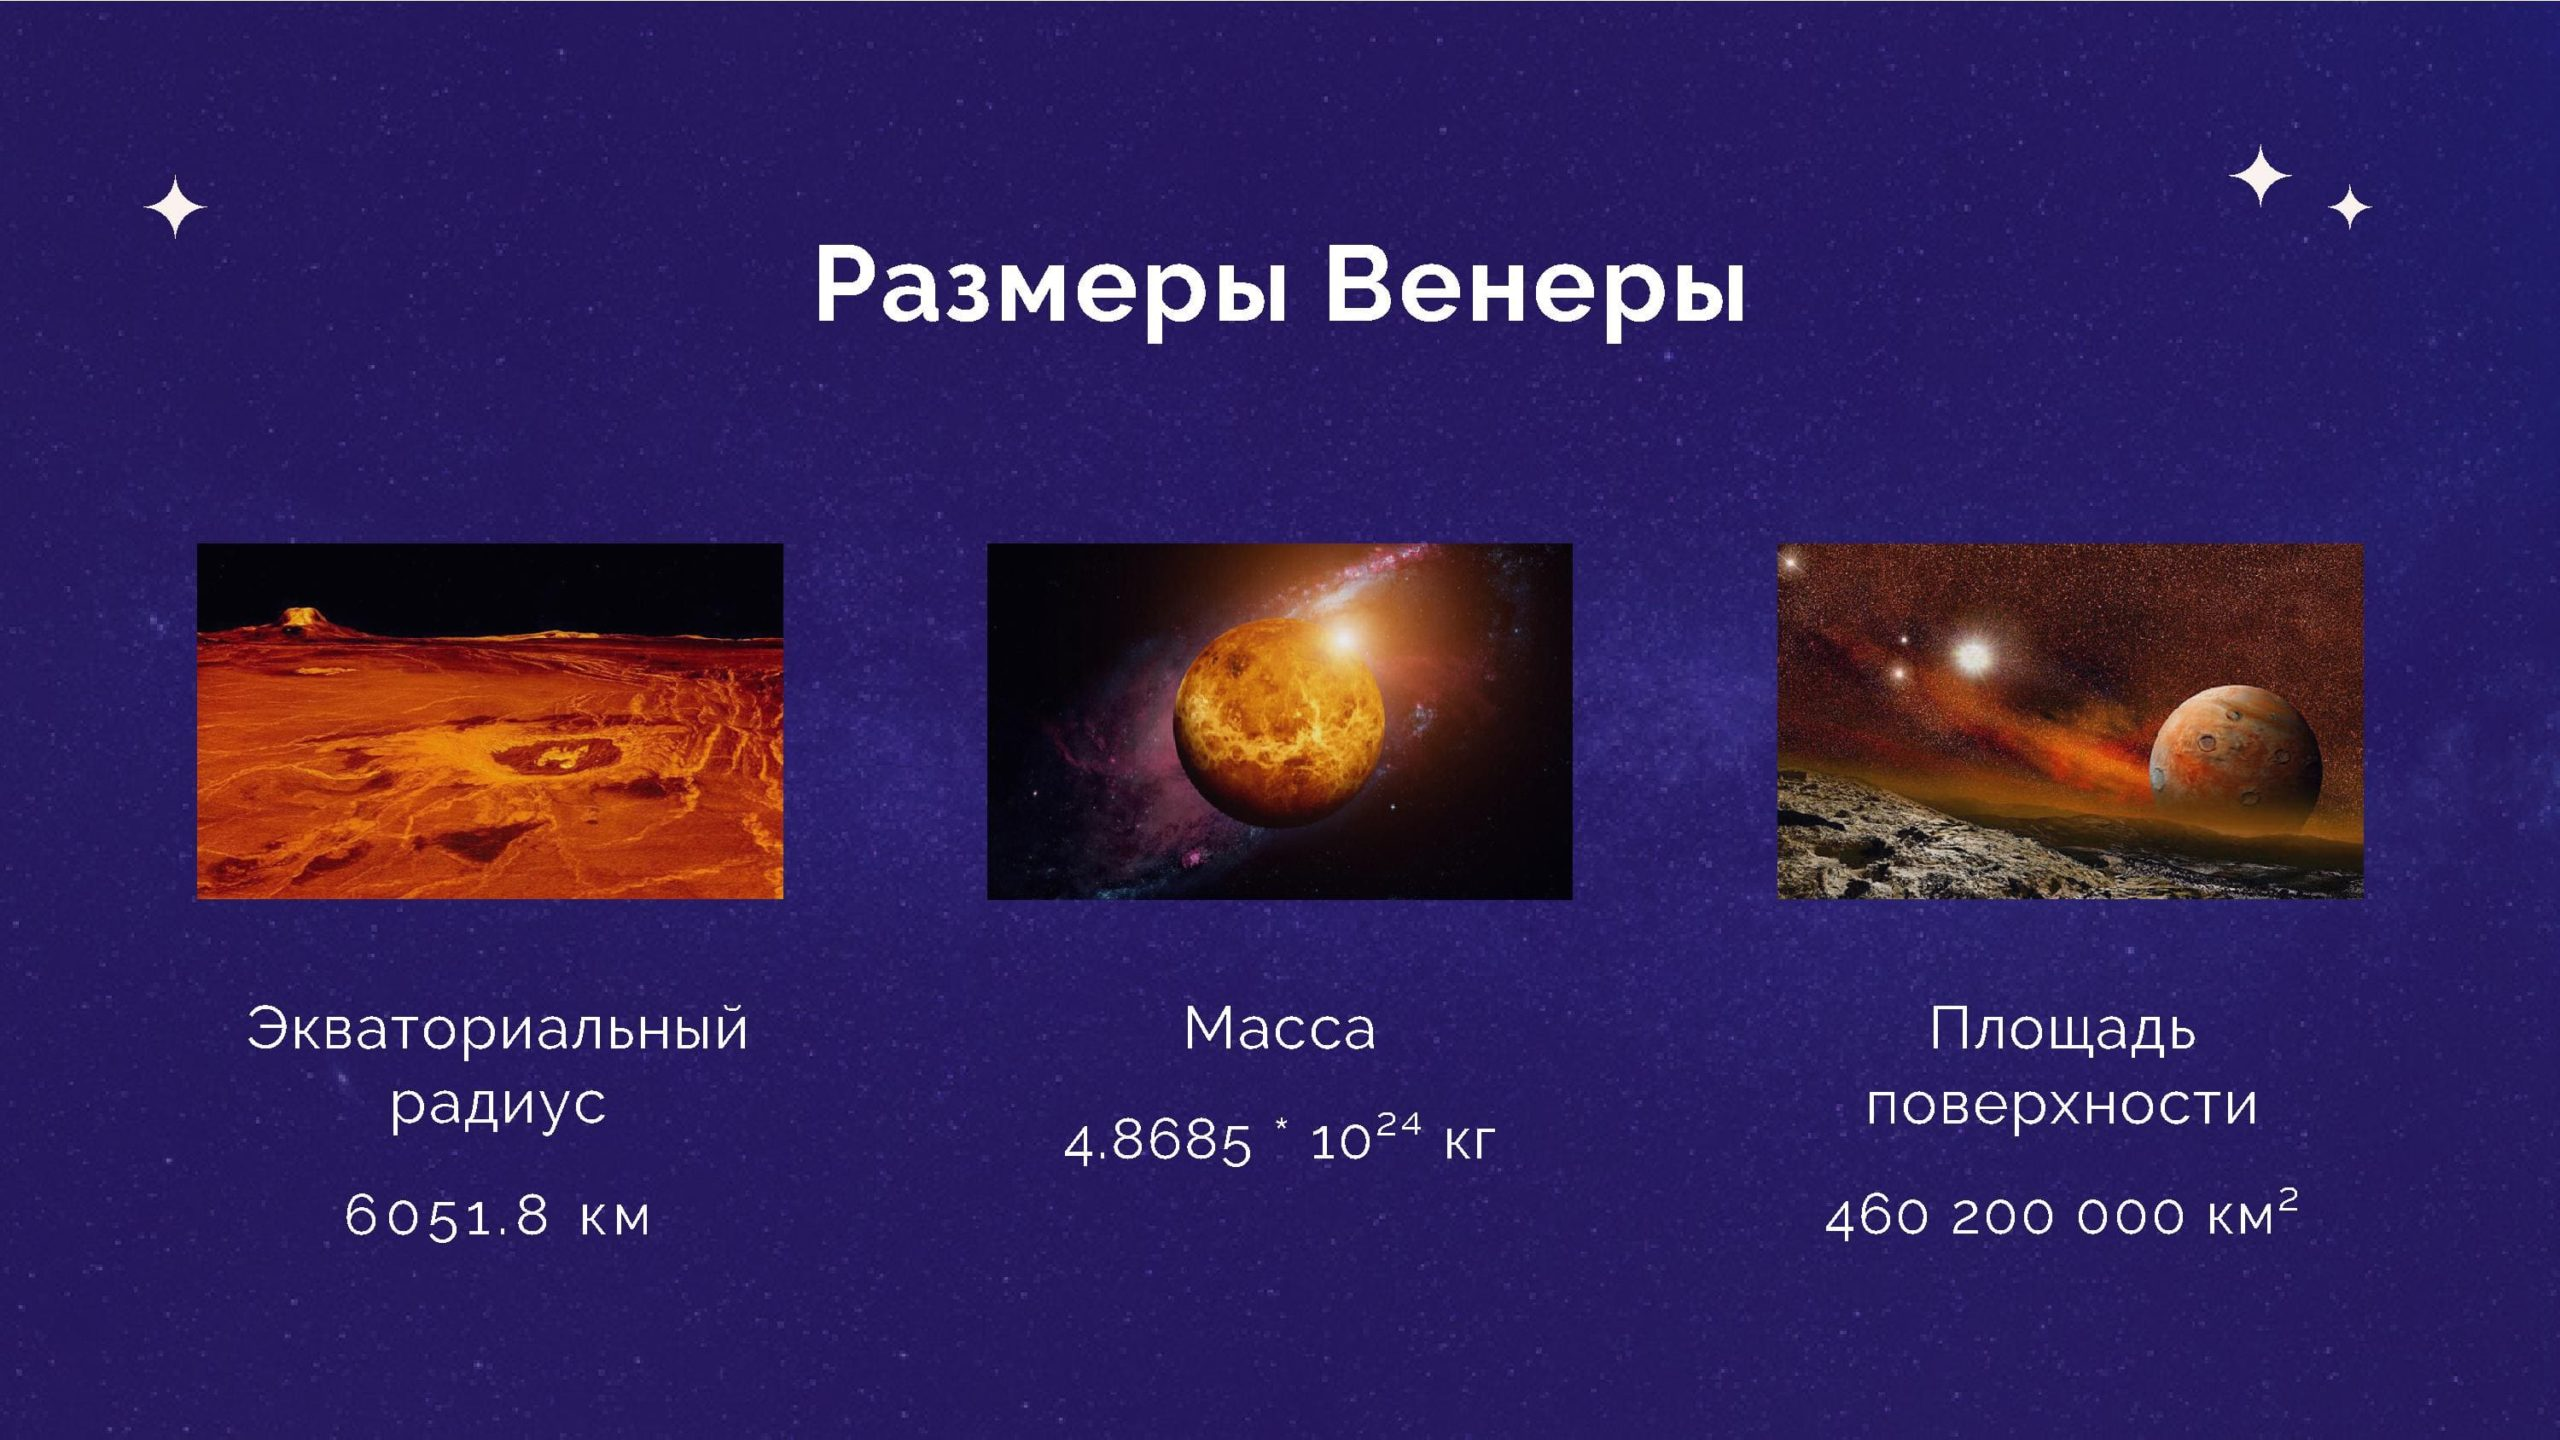 Размеры Венеры